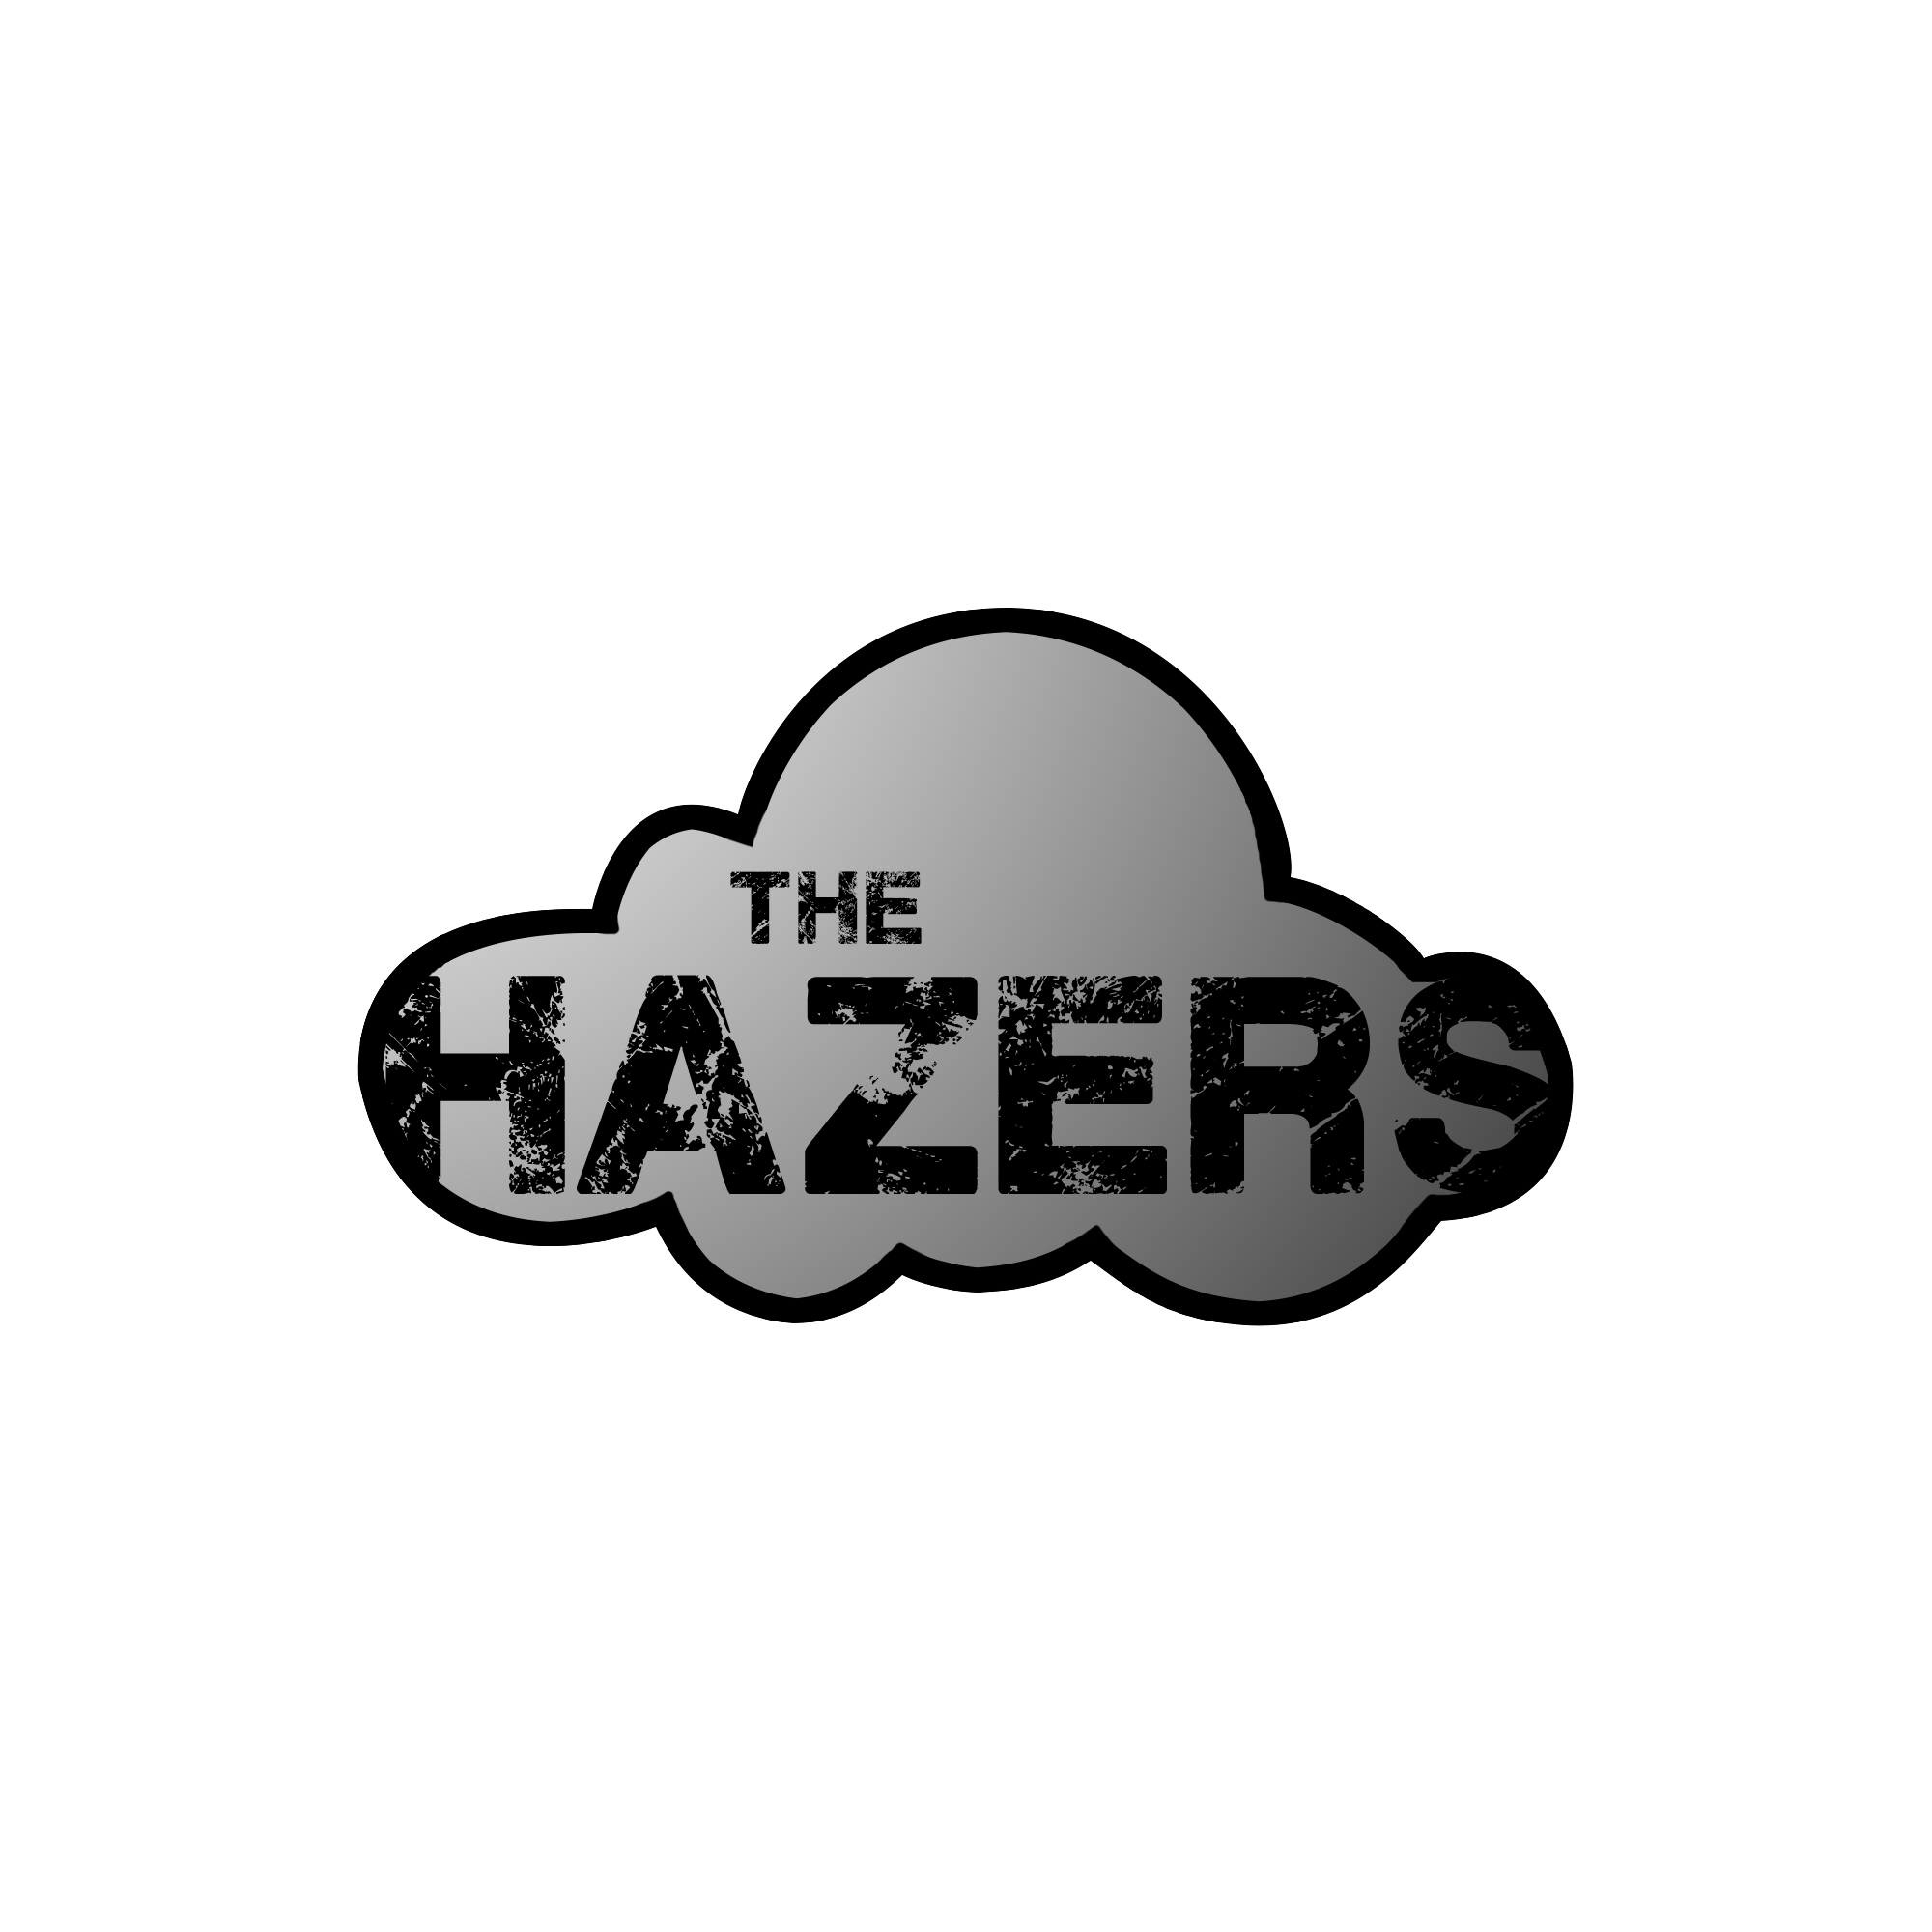 Hazers jelle smarbleruns wiki. Cloudy clipart hazy